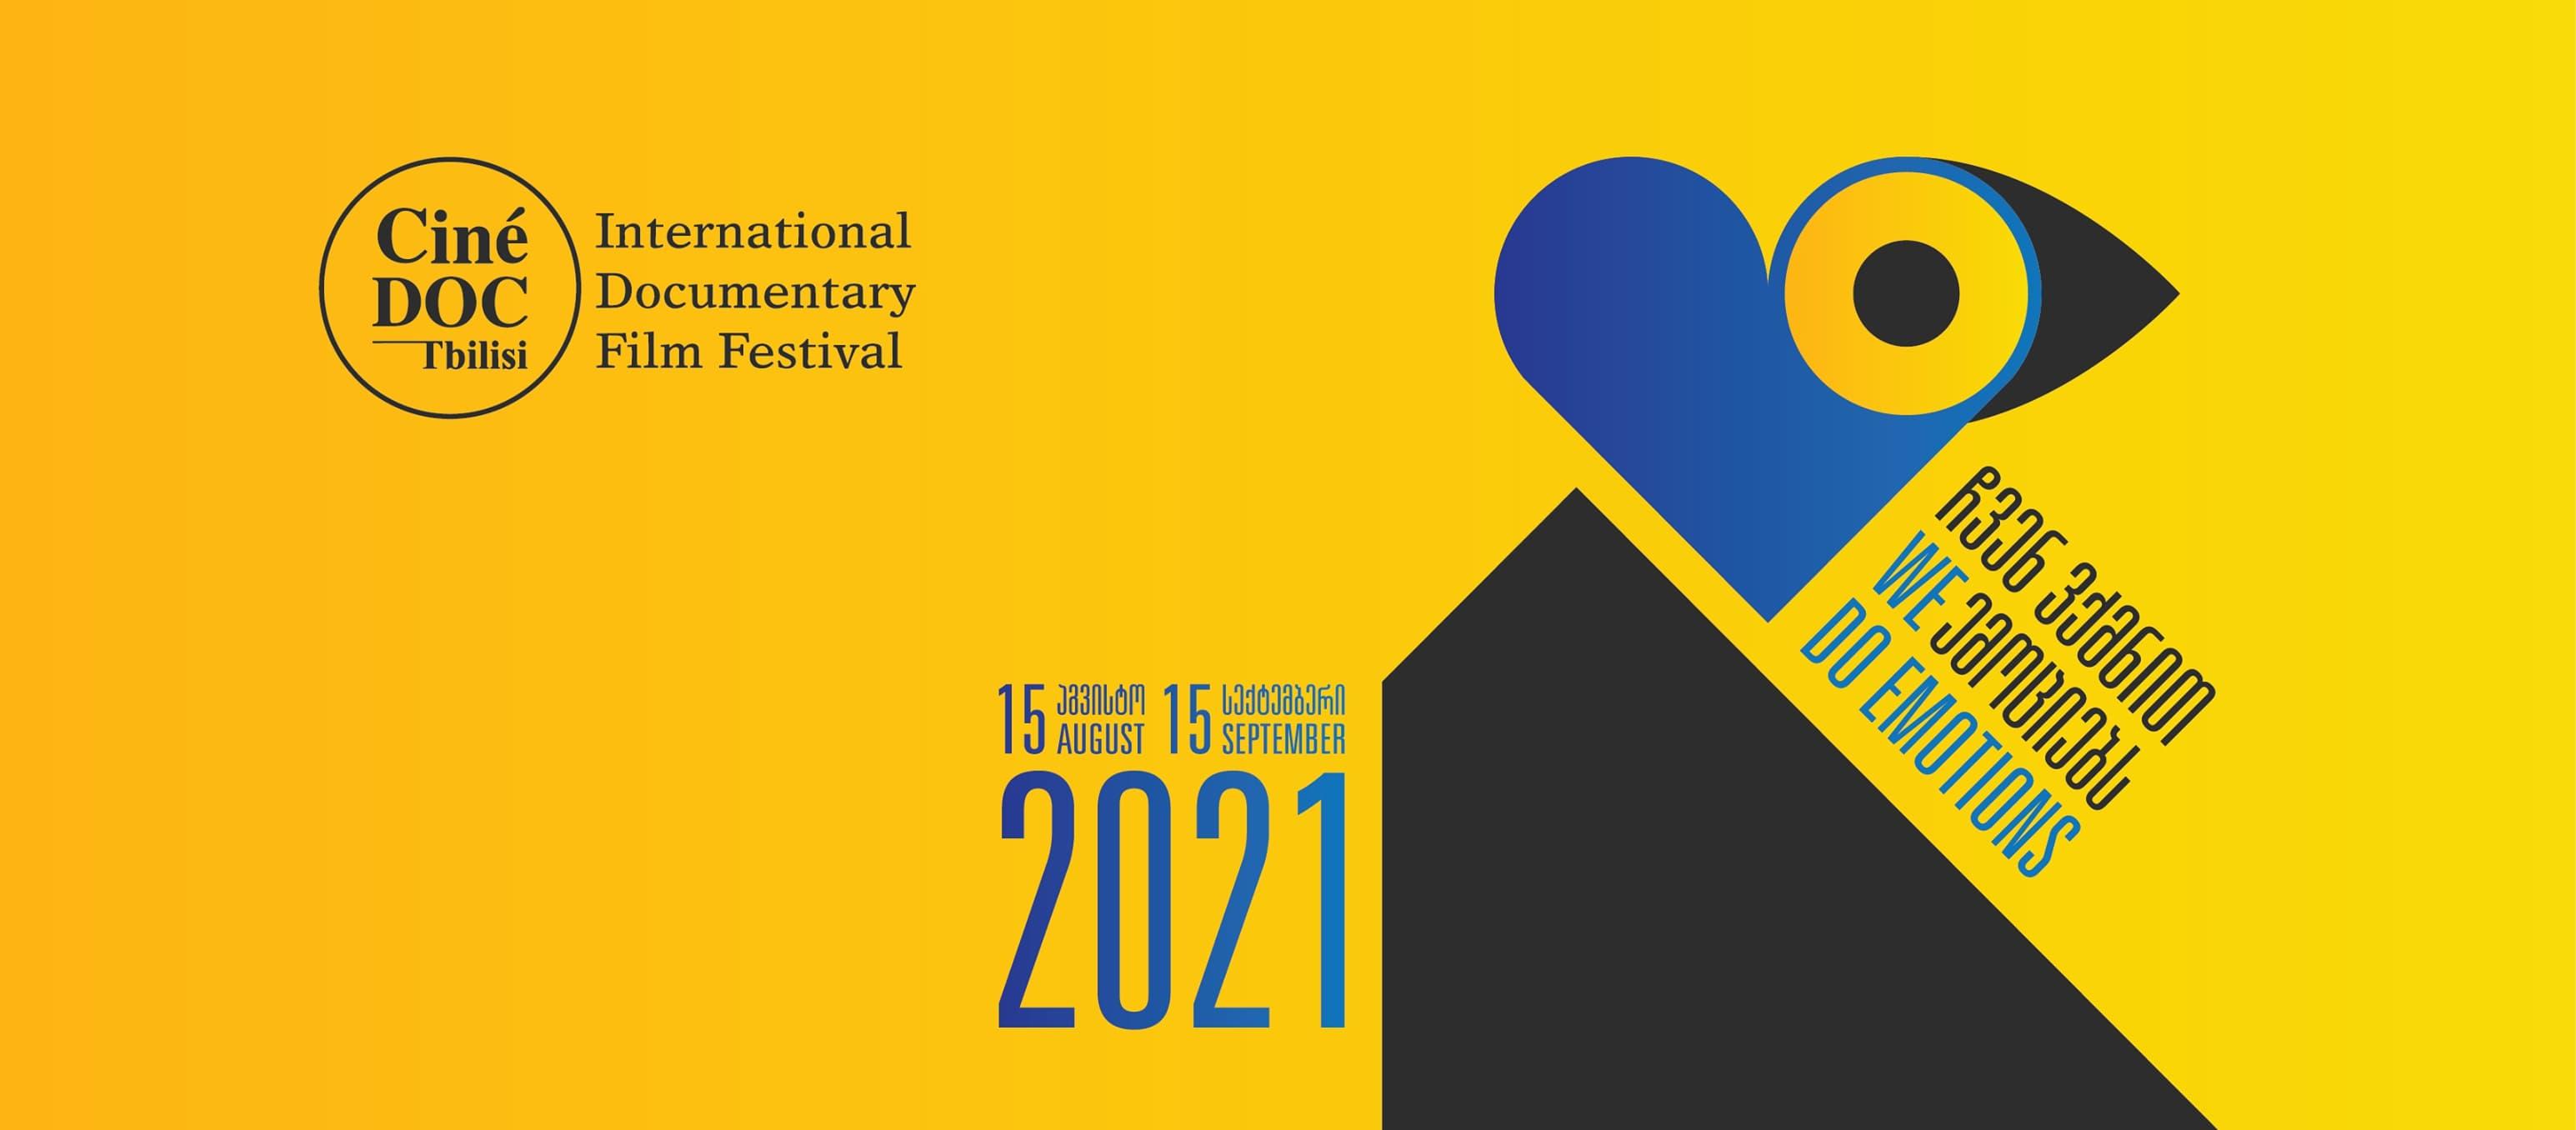 Chai Khana films at CinéDOC-Tbilisi 2021